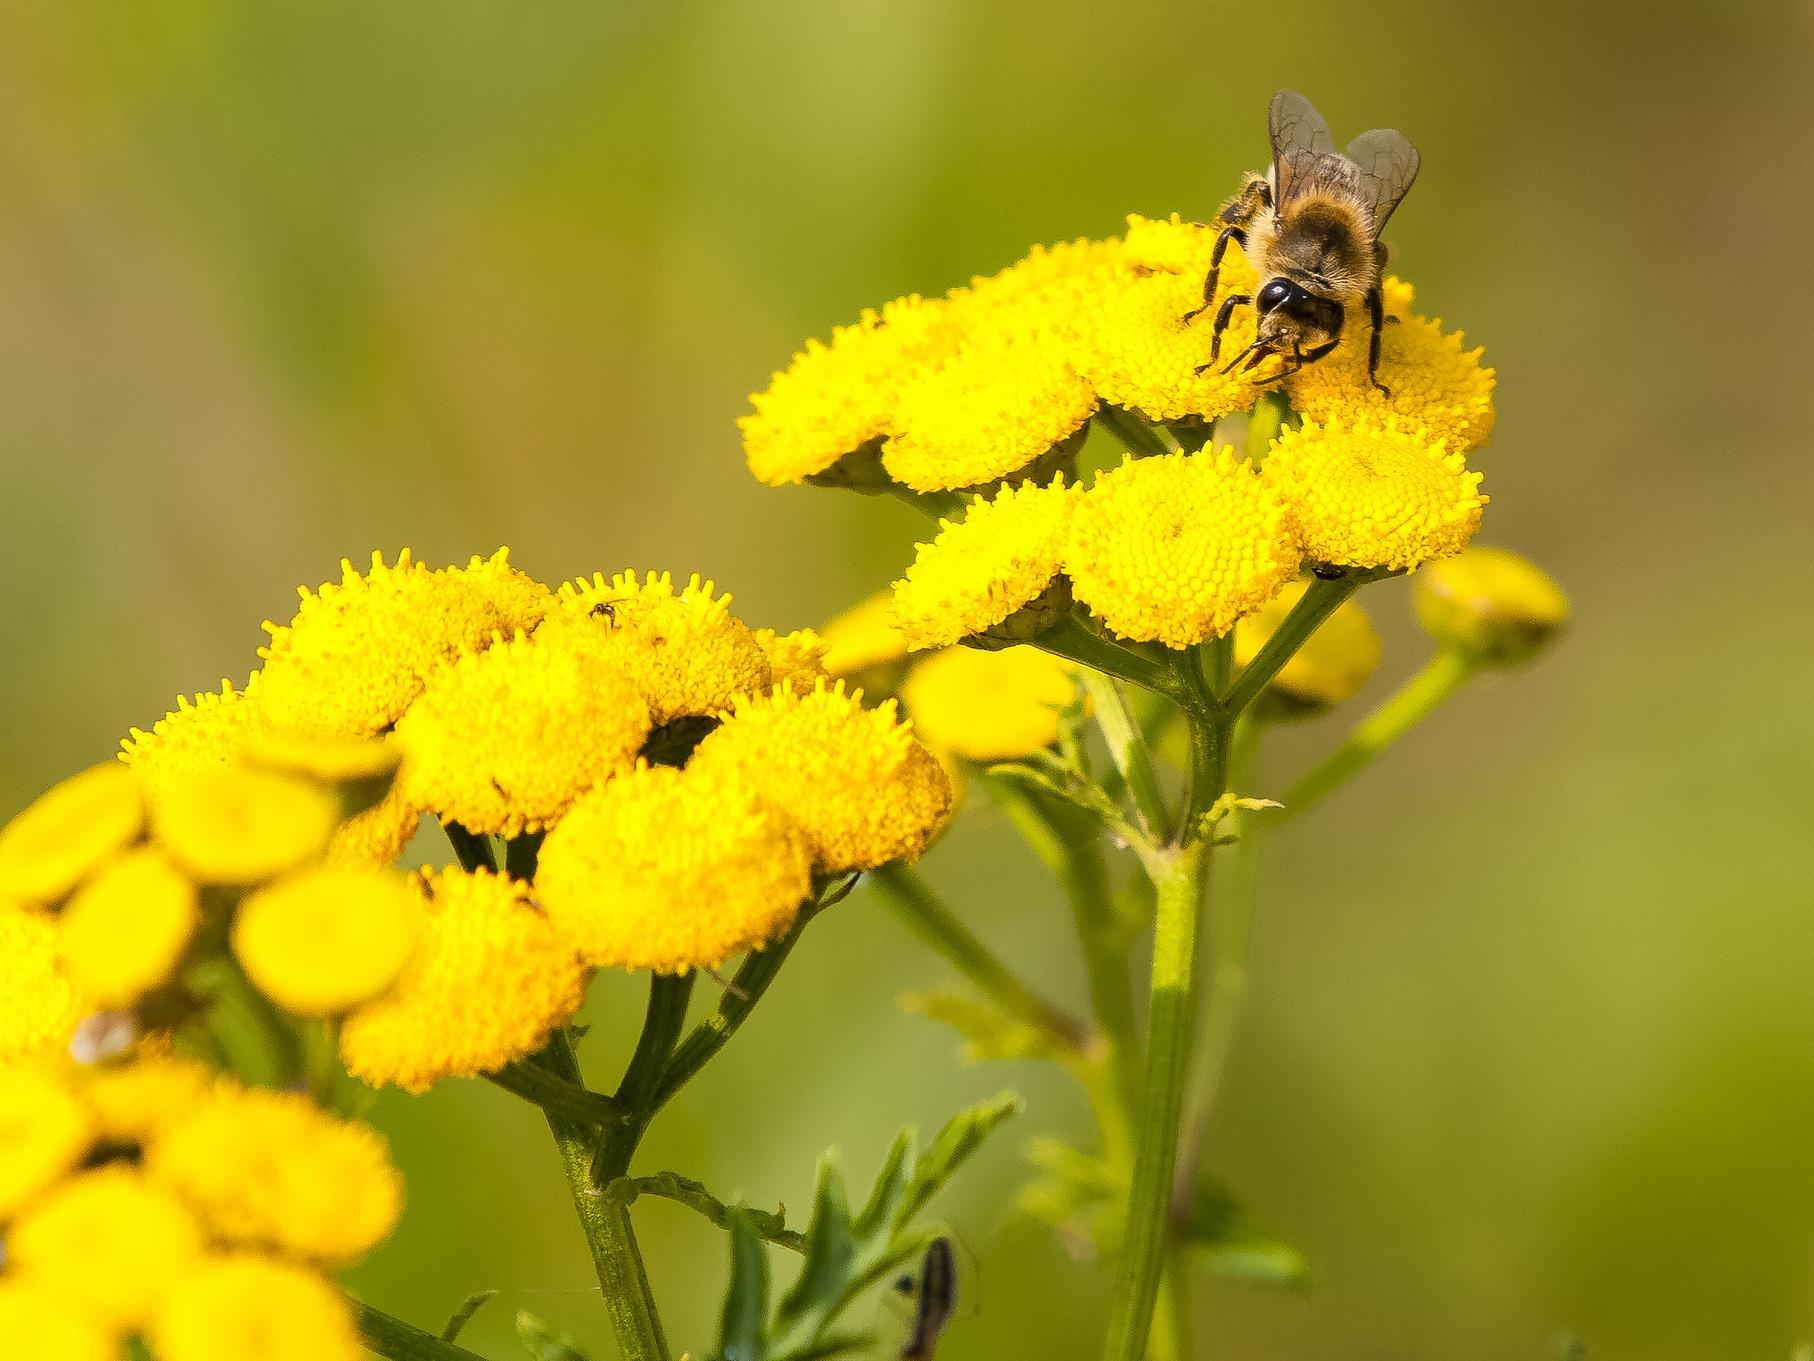 Honigbiene auf Rainfarn.